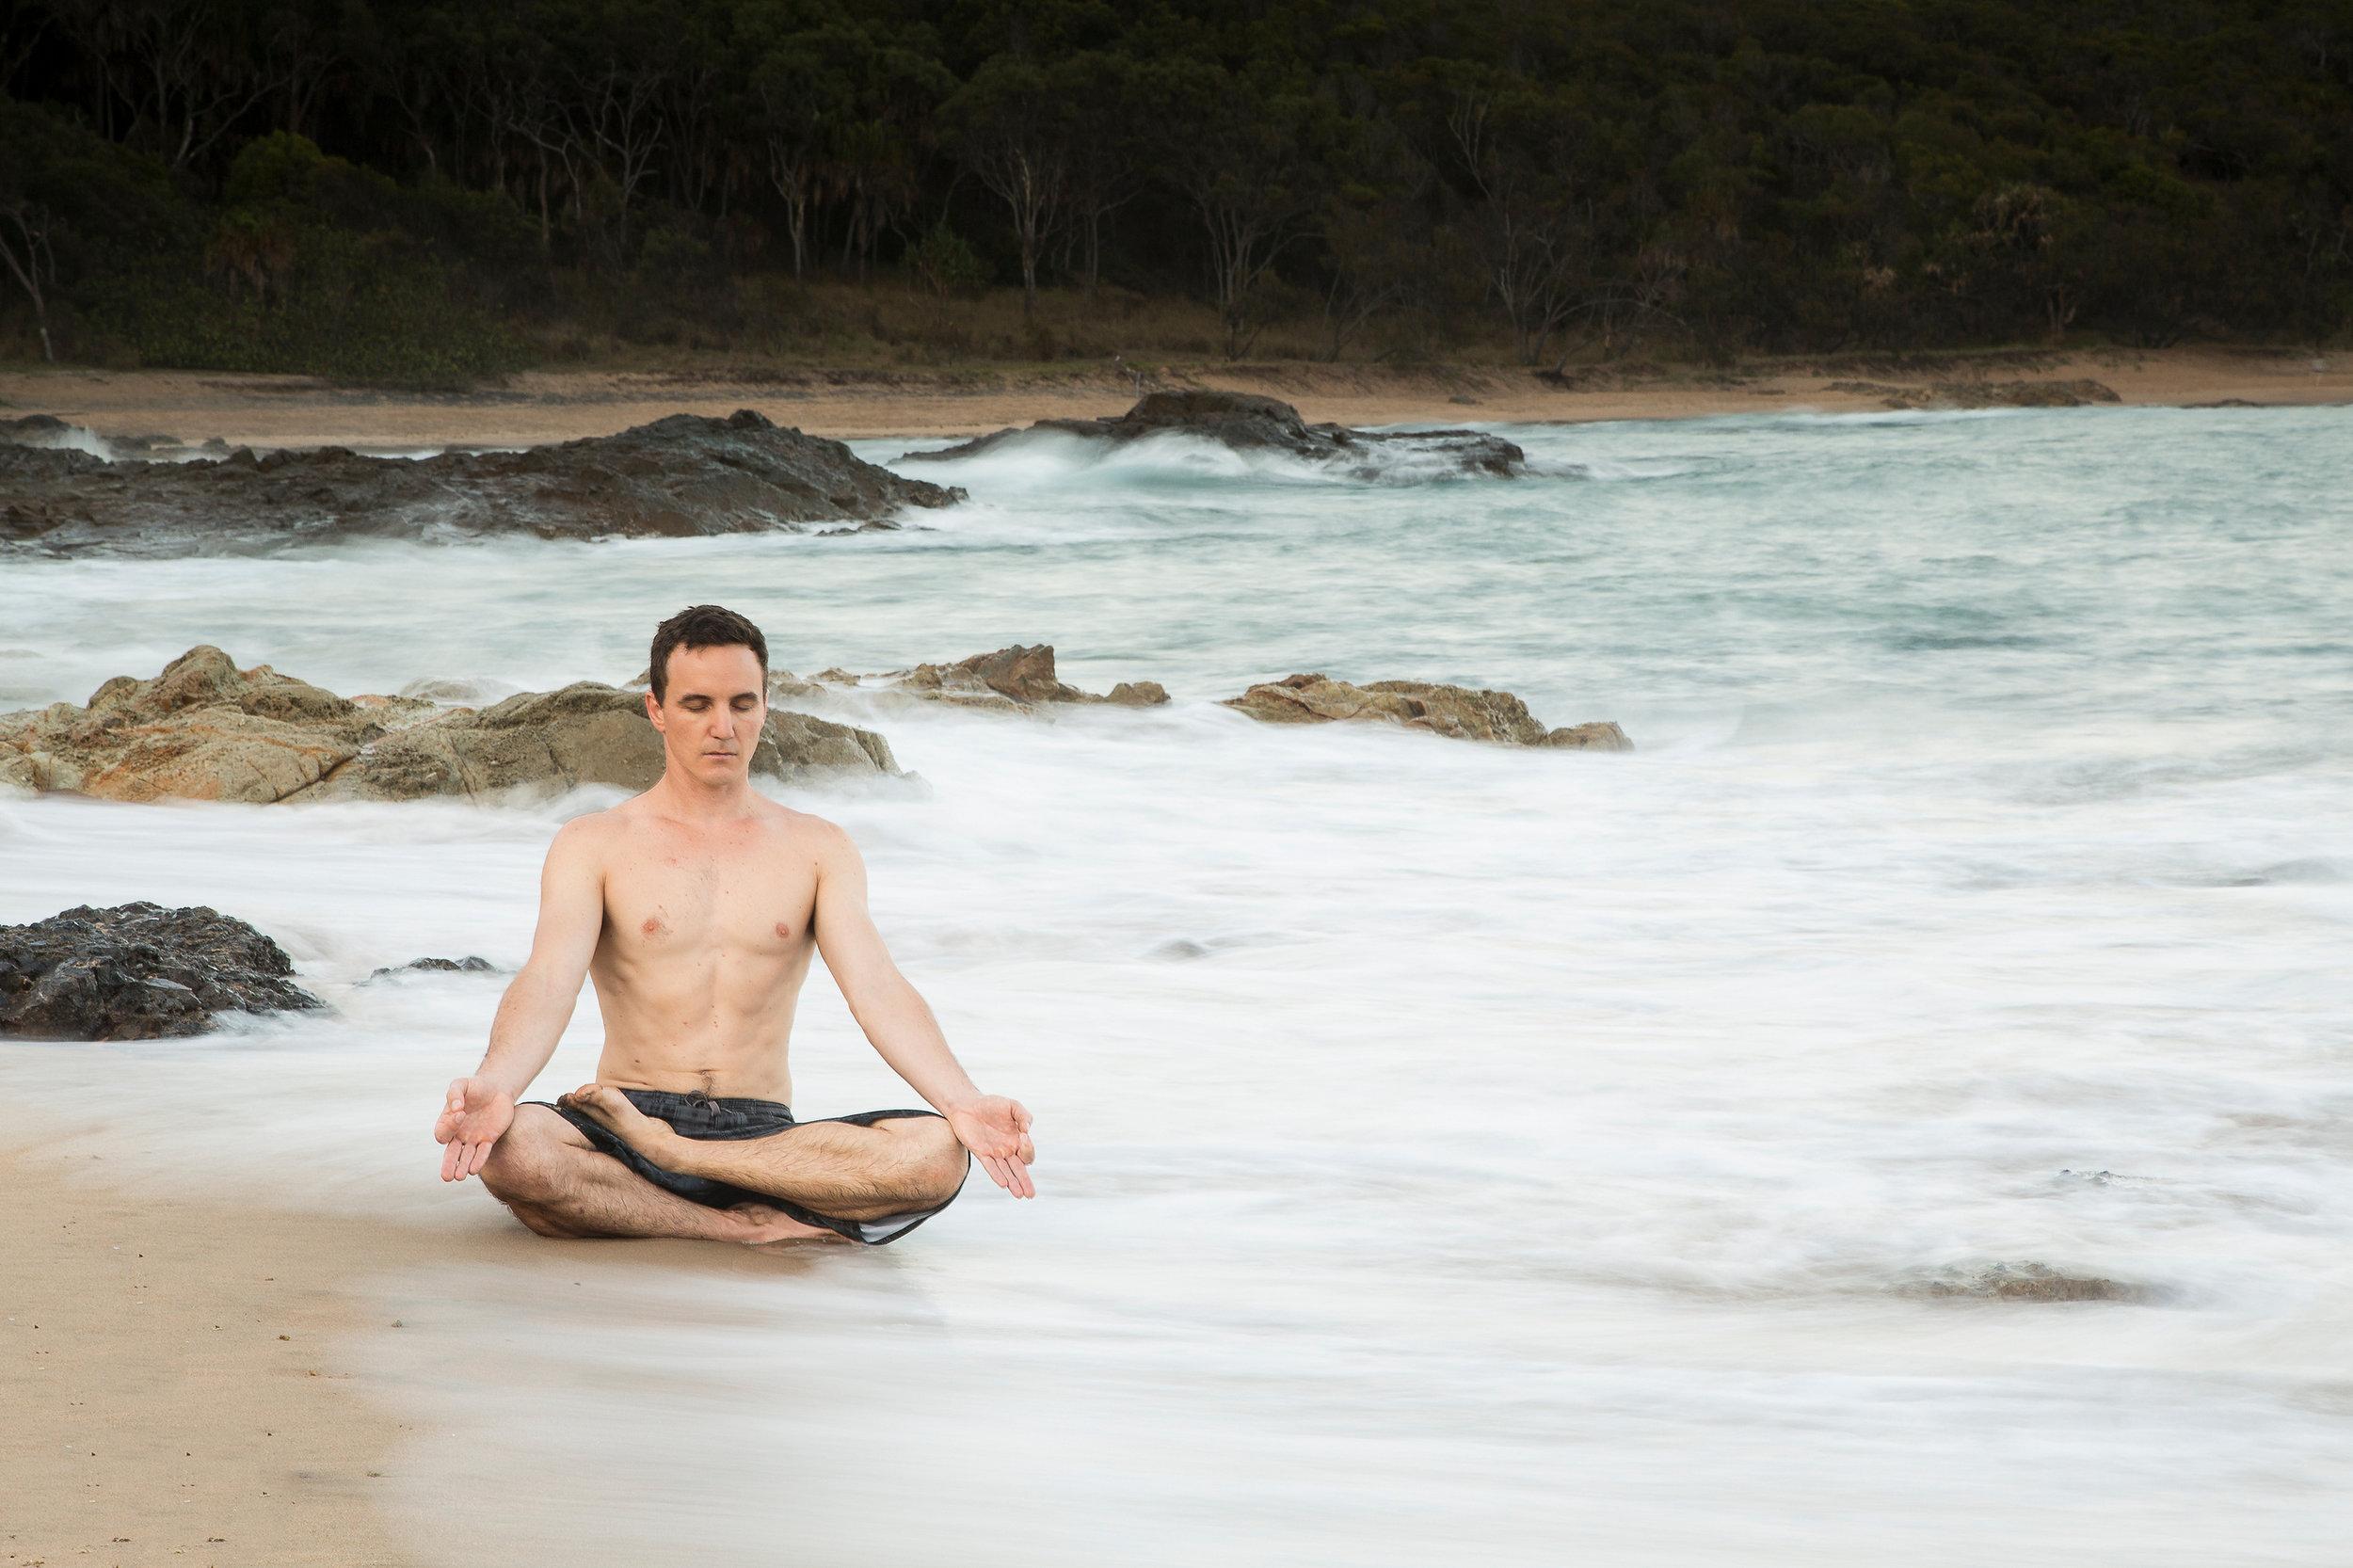 Yoga_with_Paul_081115_010-(ZF-4930-31220-1-010).jpg